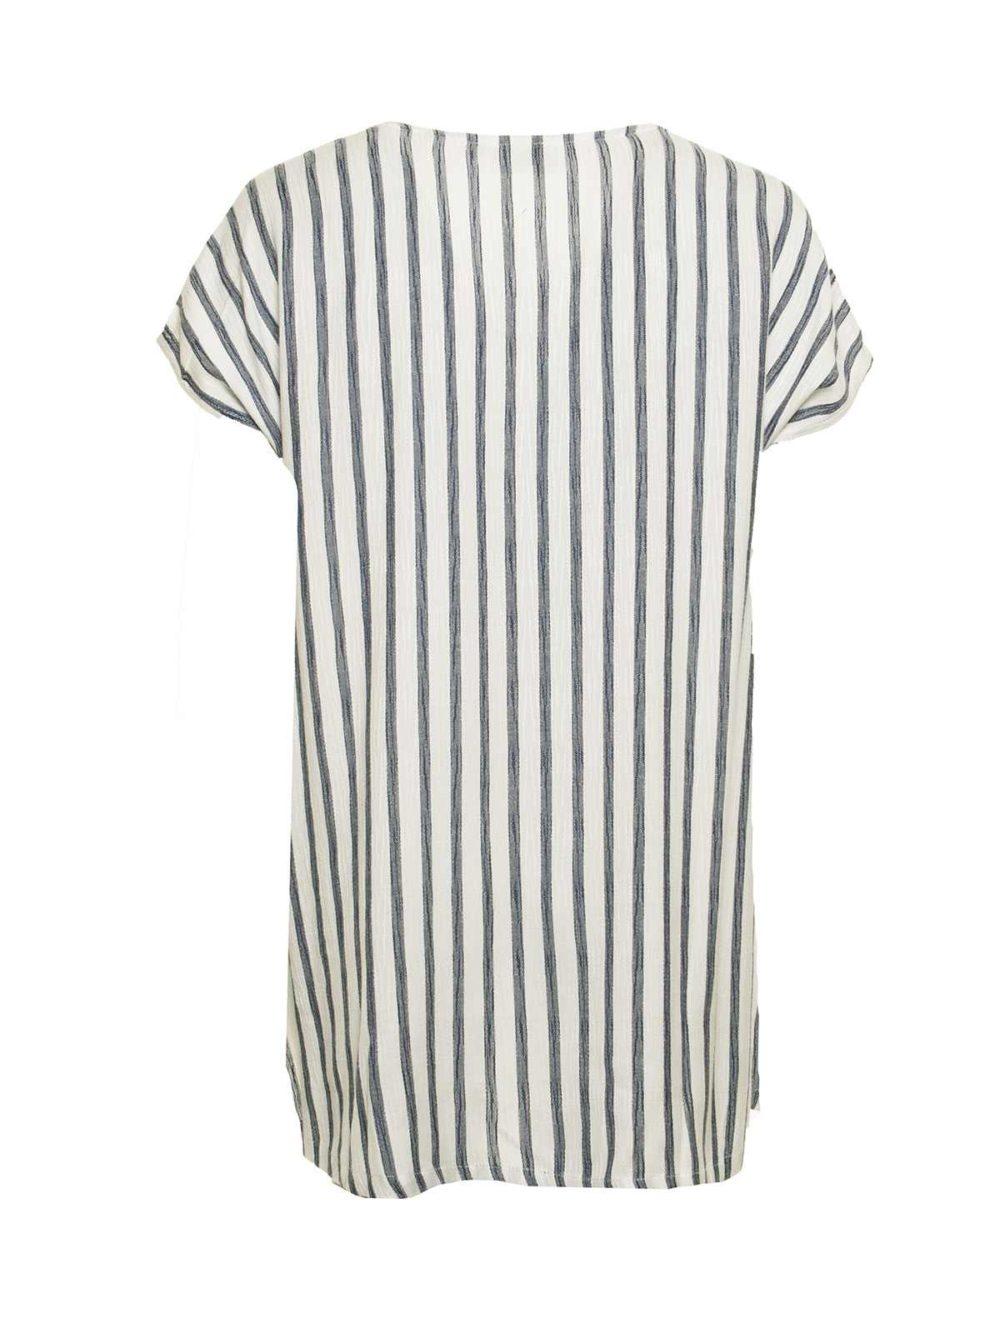 TQY-8121 Top Capri Katie Kerr Women's Clothing